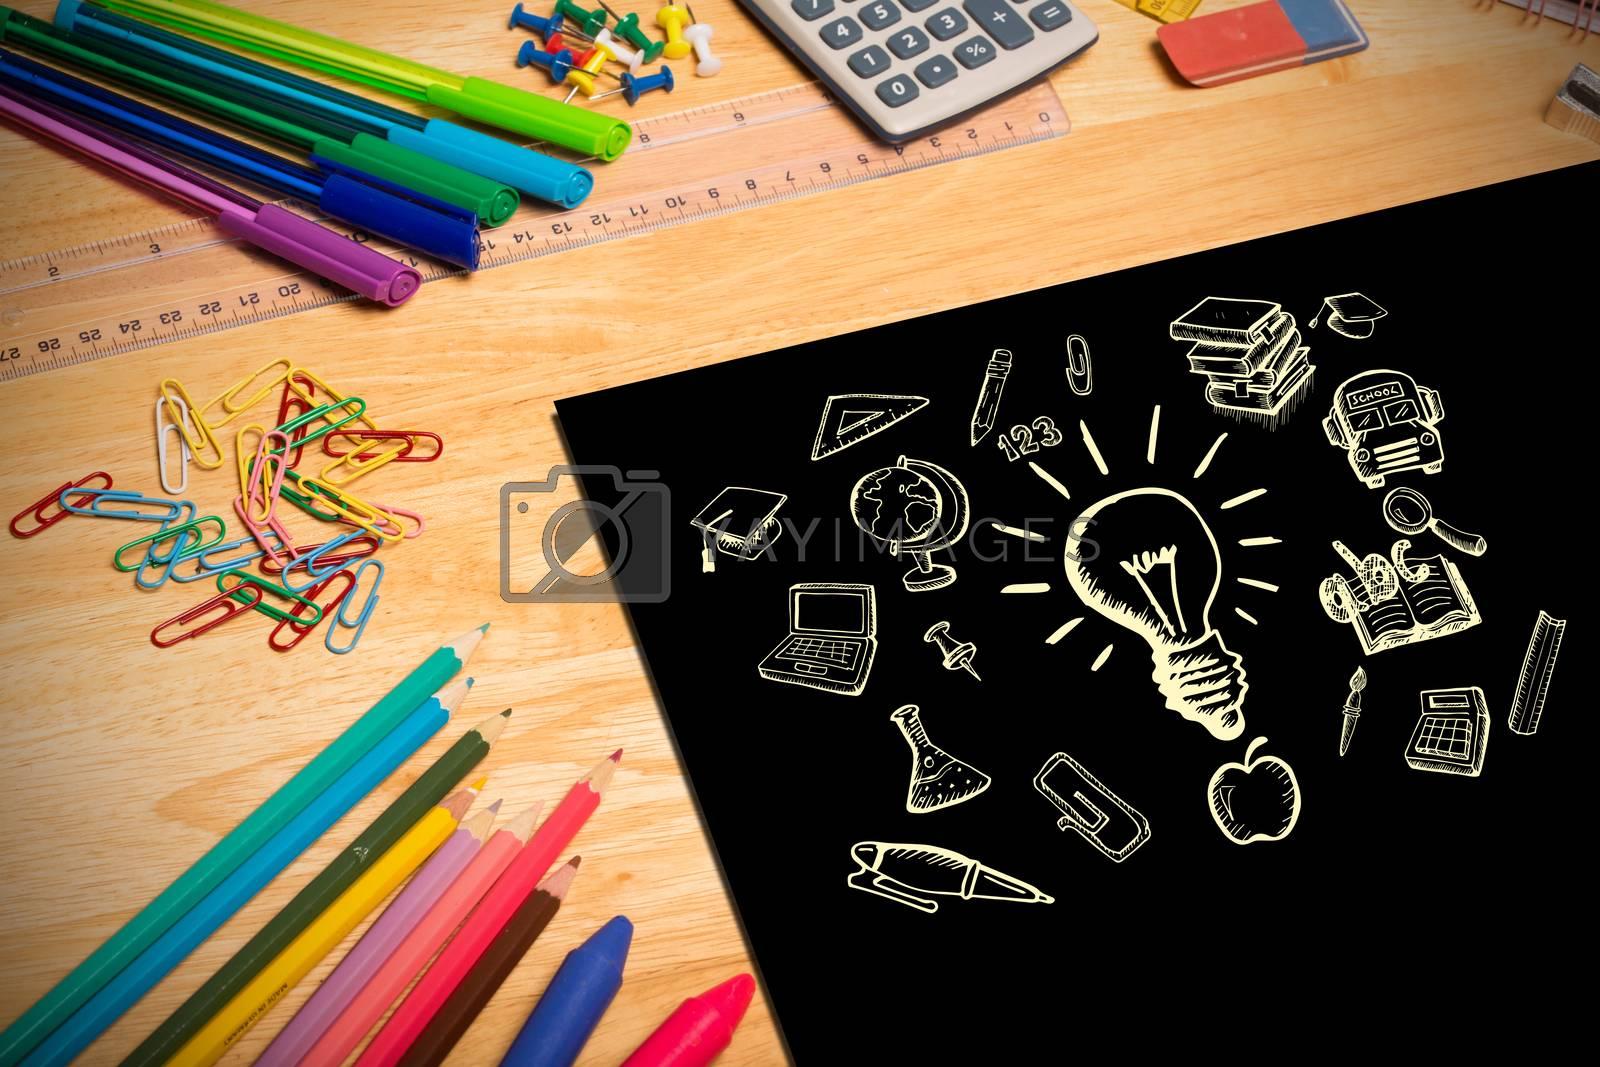 Composite image of education doodles against students desk